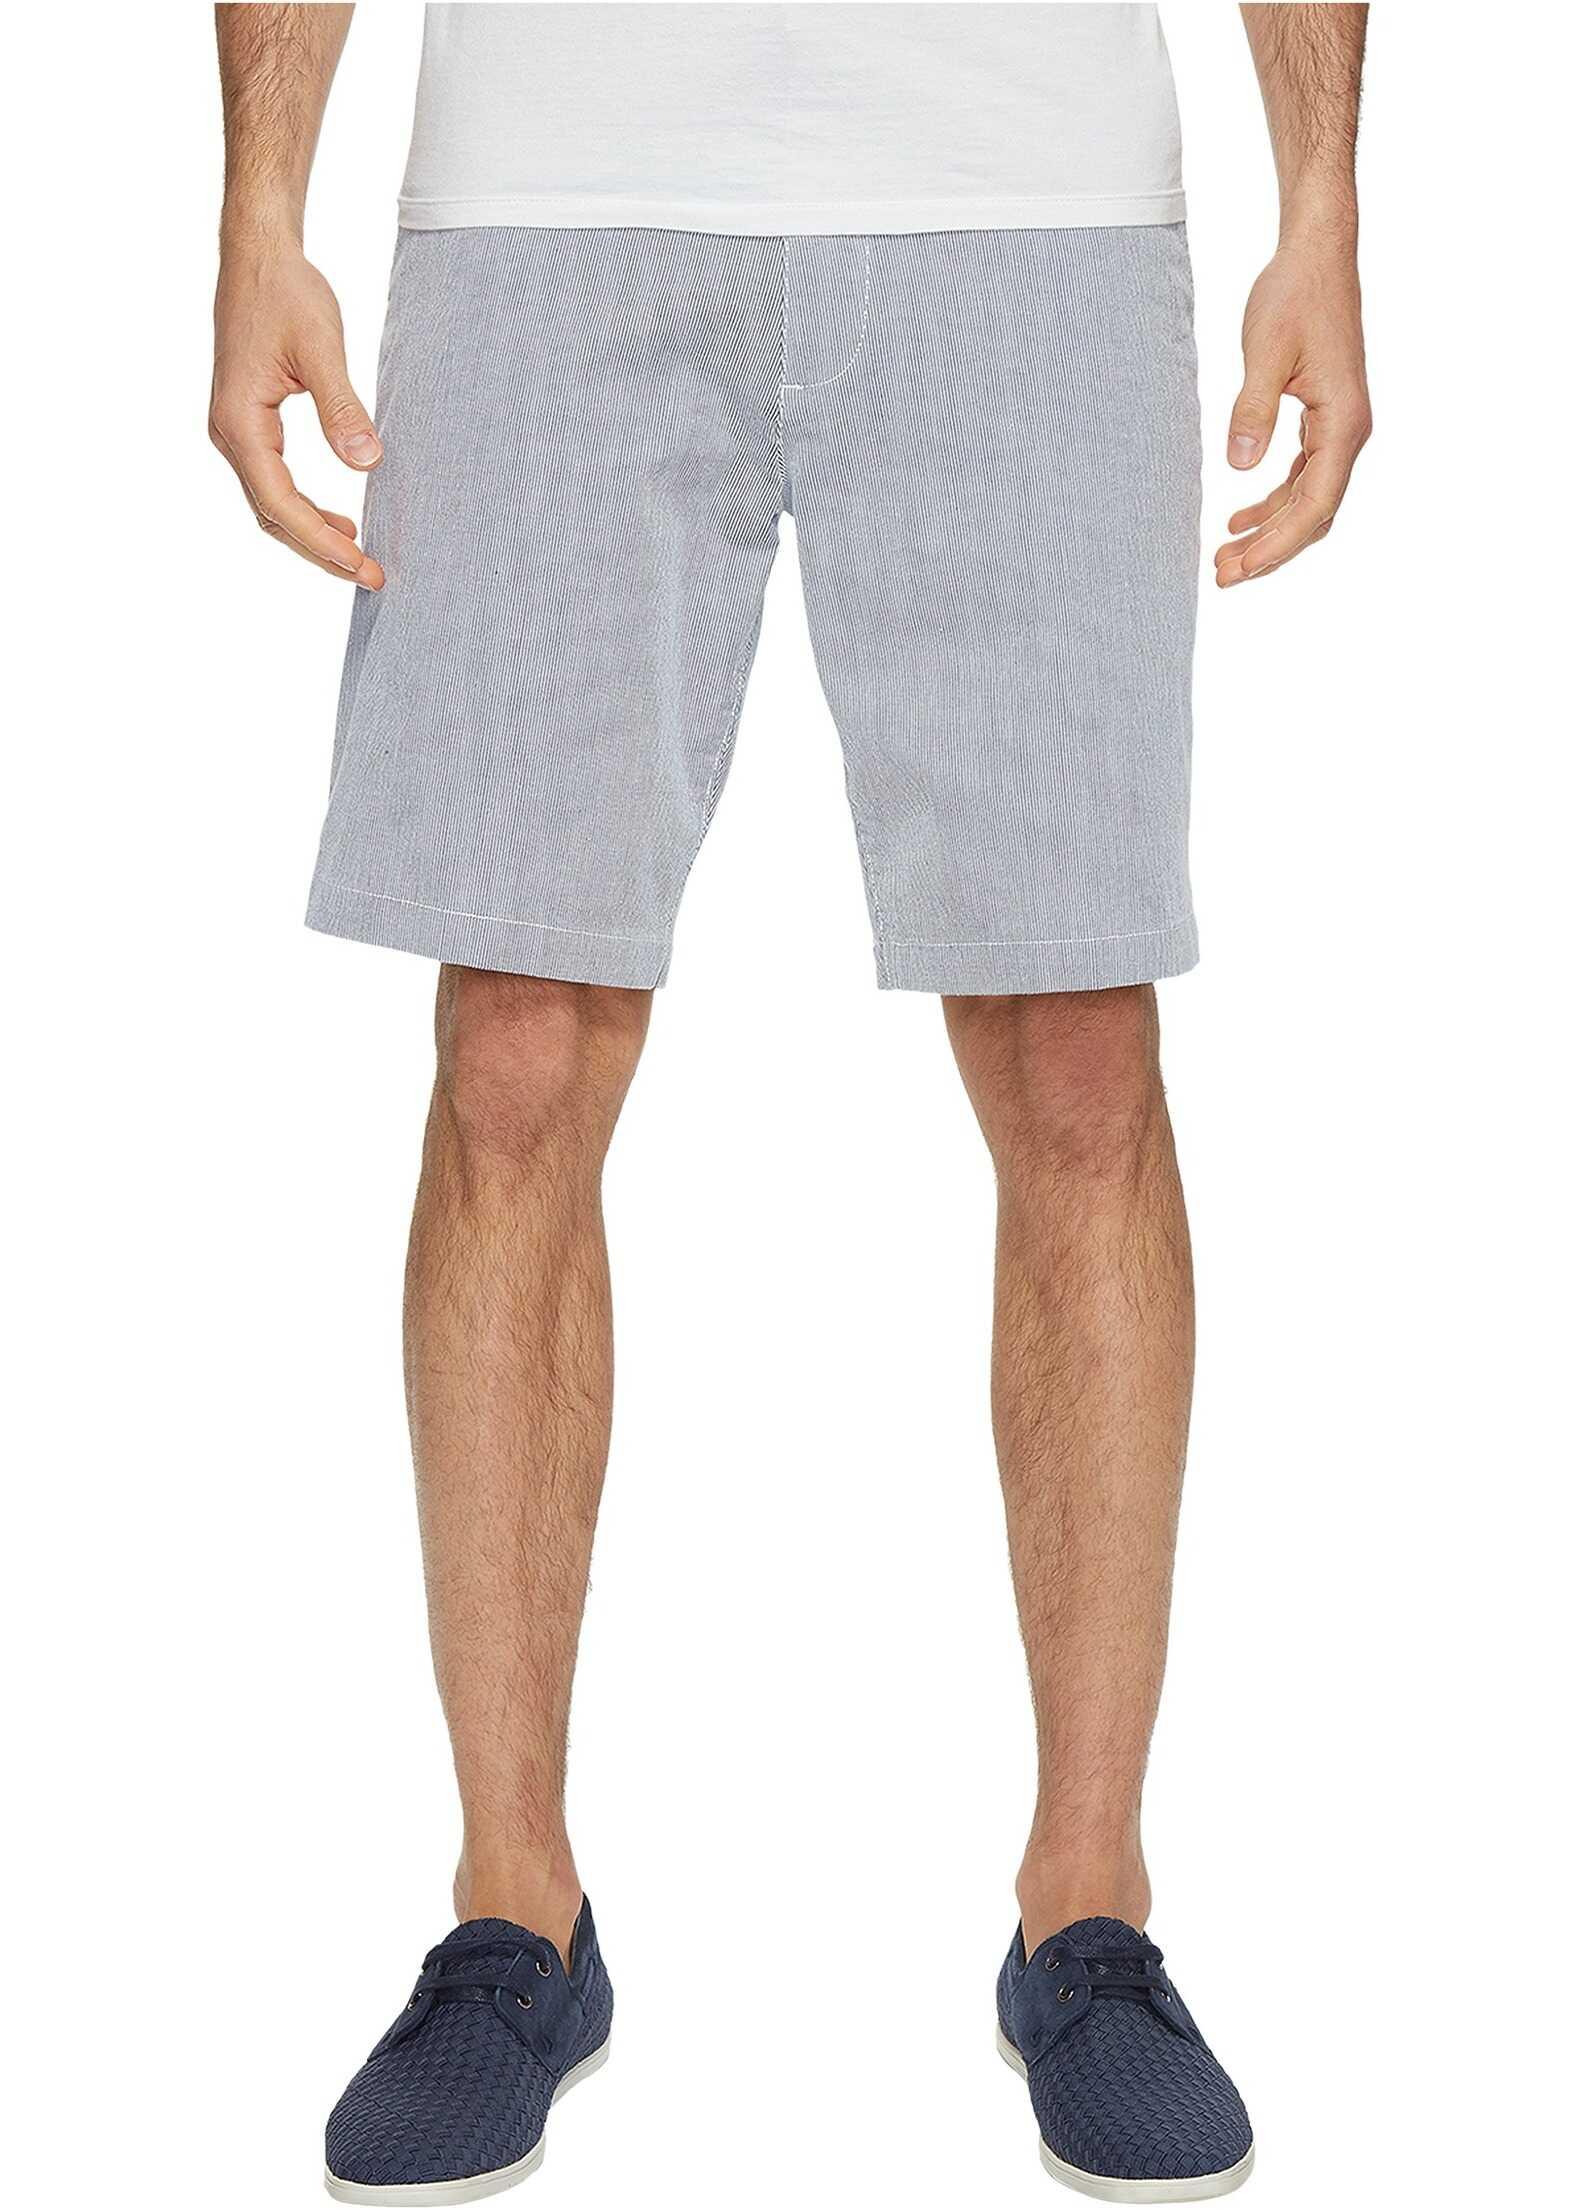 Dockers Perfect Short Classic Fit Flat Front Oliver Moonlit Ocean Stretch